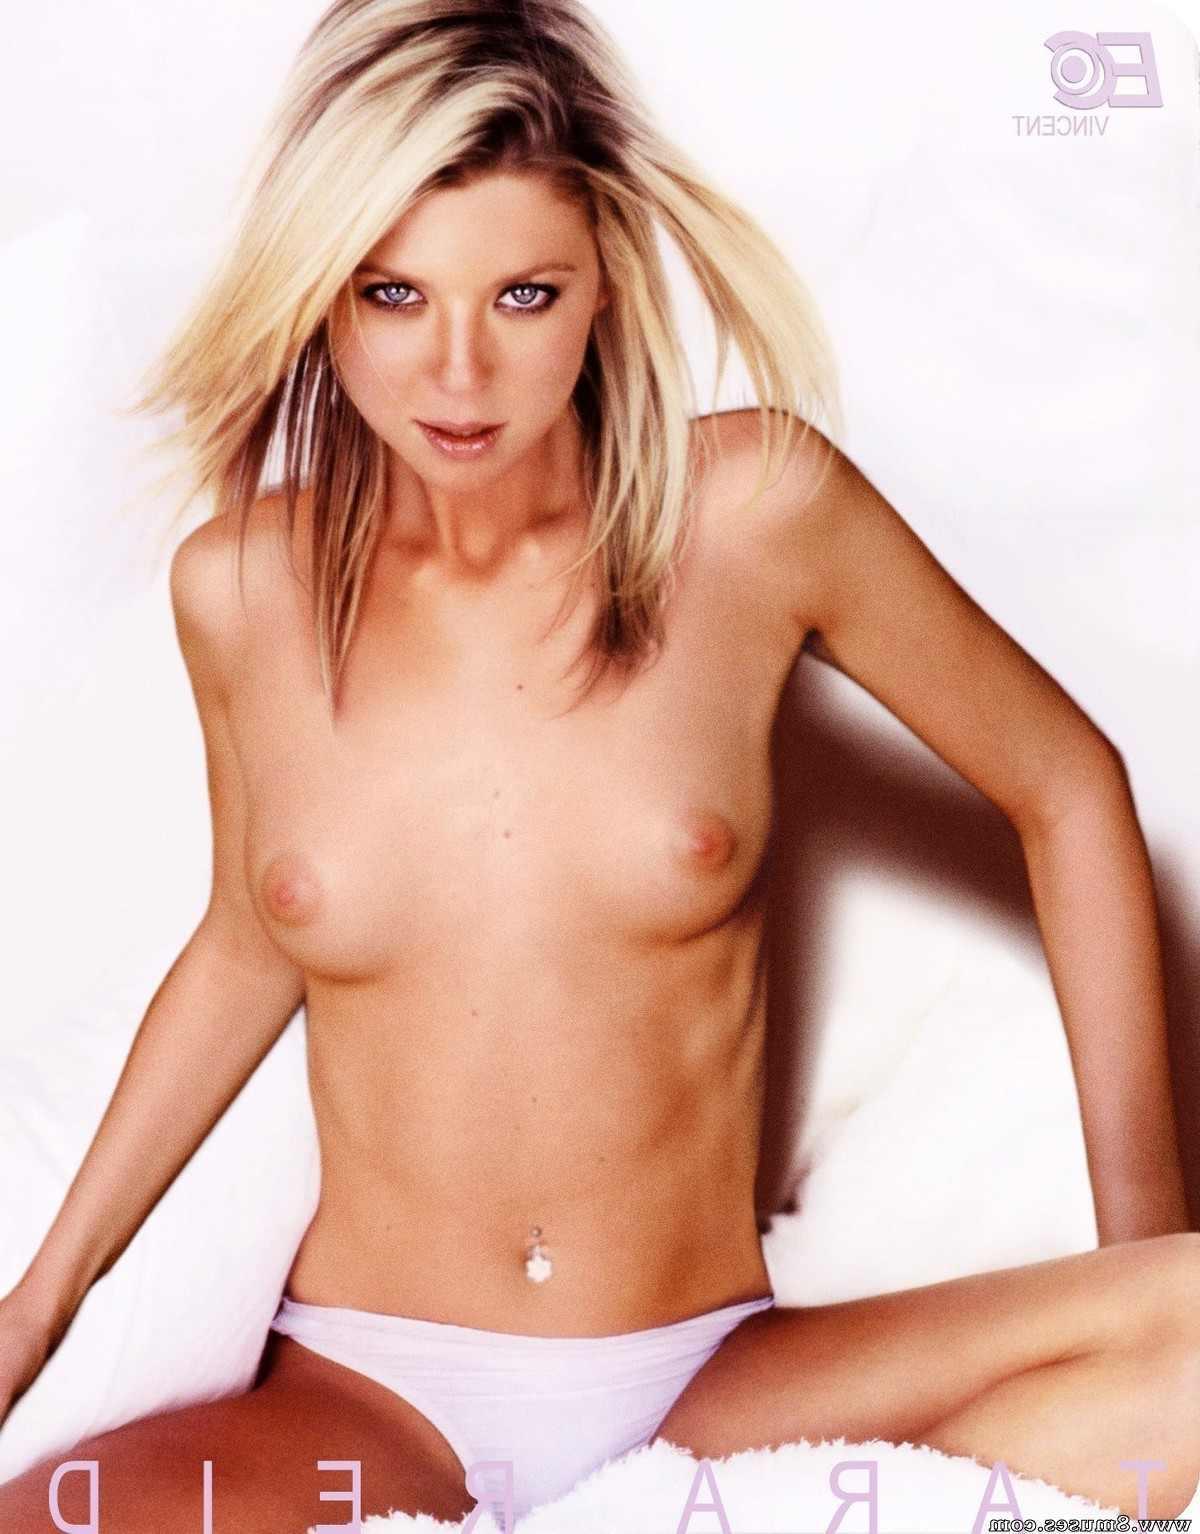 Fake-Celebrities-Sex-Pictures/Tara-Reid Tara_Reid__8muses_-_Sex_and_Porn_Comics_209.jpg